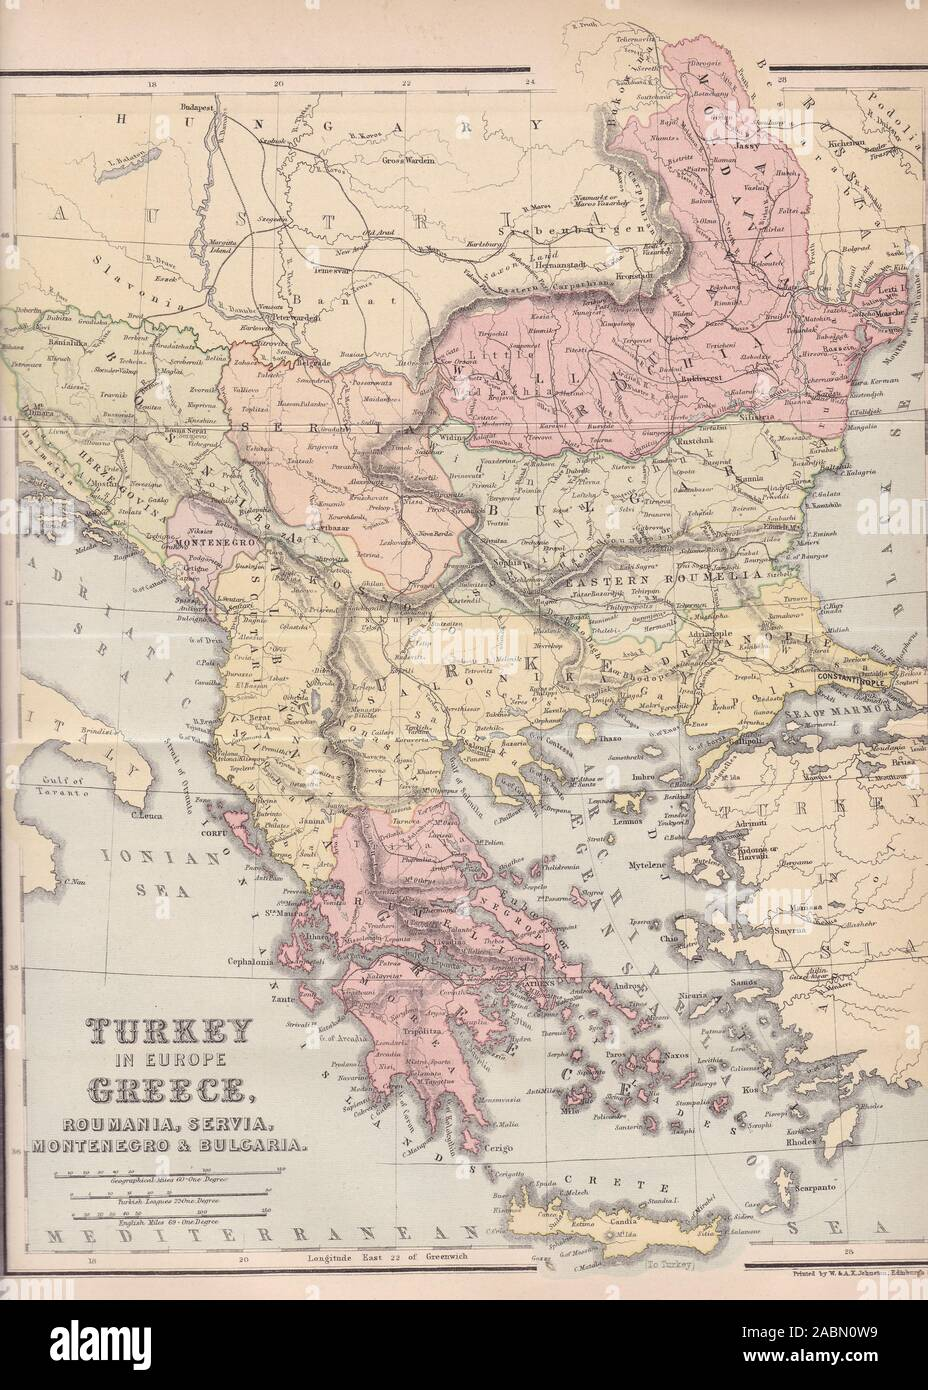 Map Of Turkey And Greece : turkey, greece, Turkey, Greece, Bulgaria, Resolution, Stock, Photography, Images, Alamy